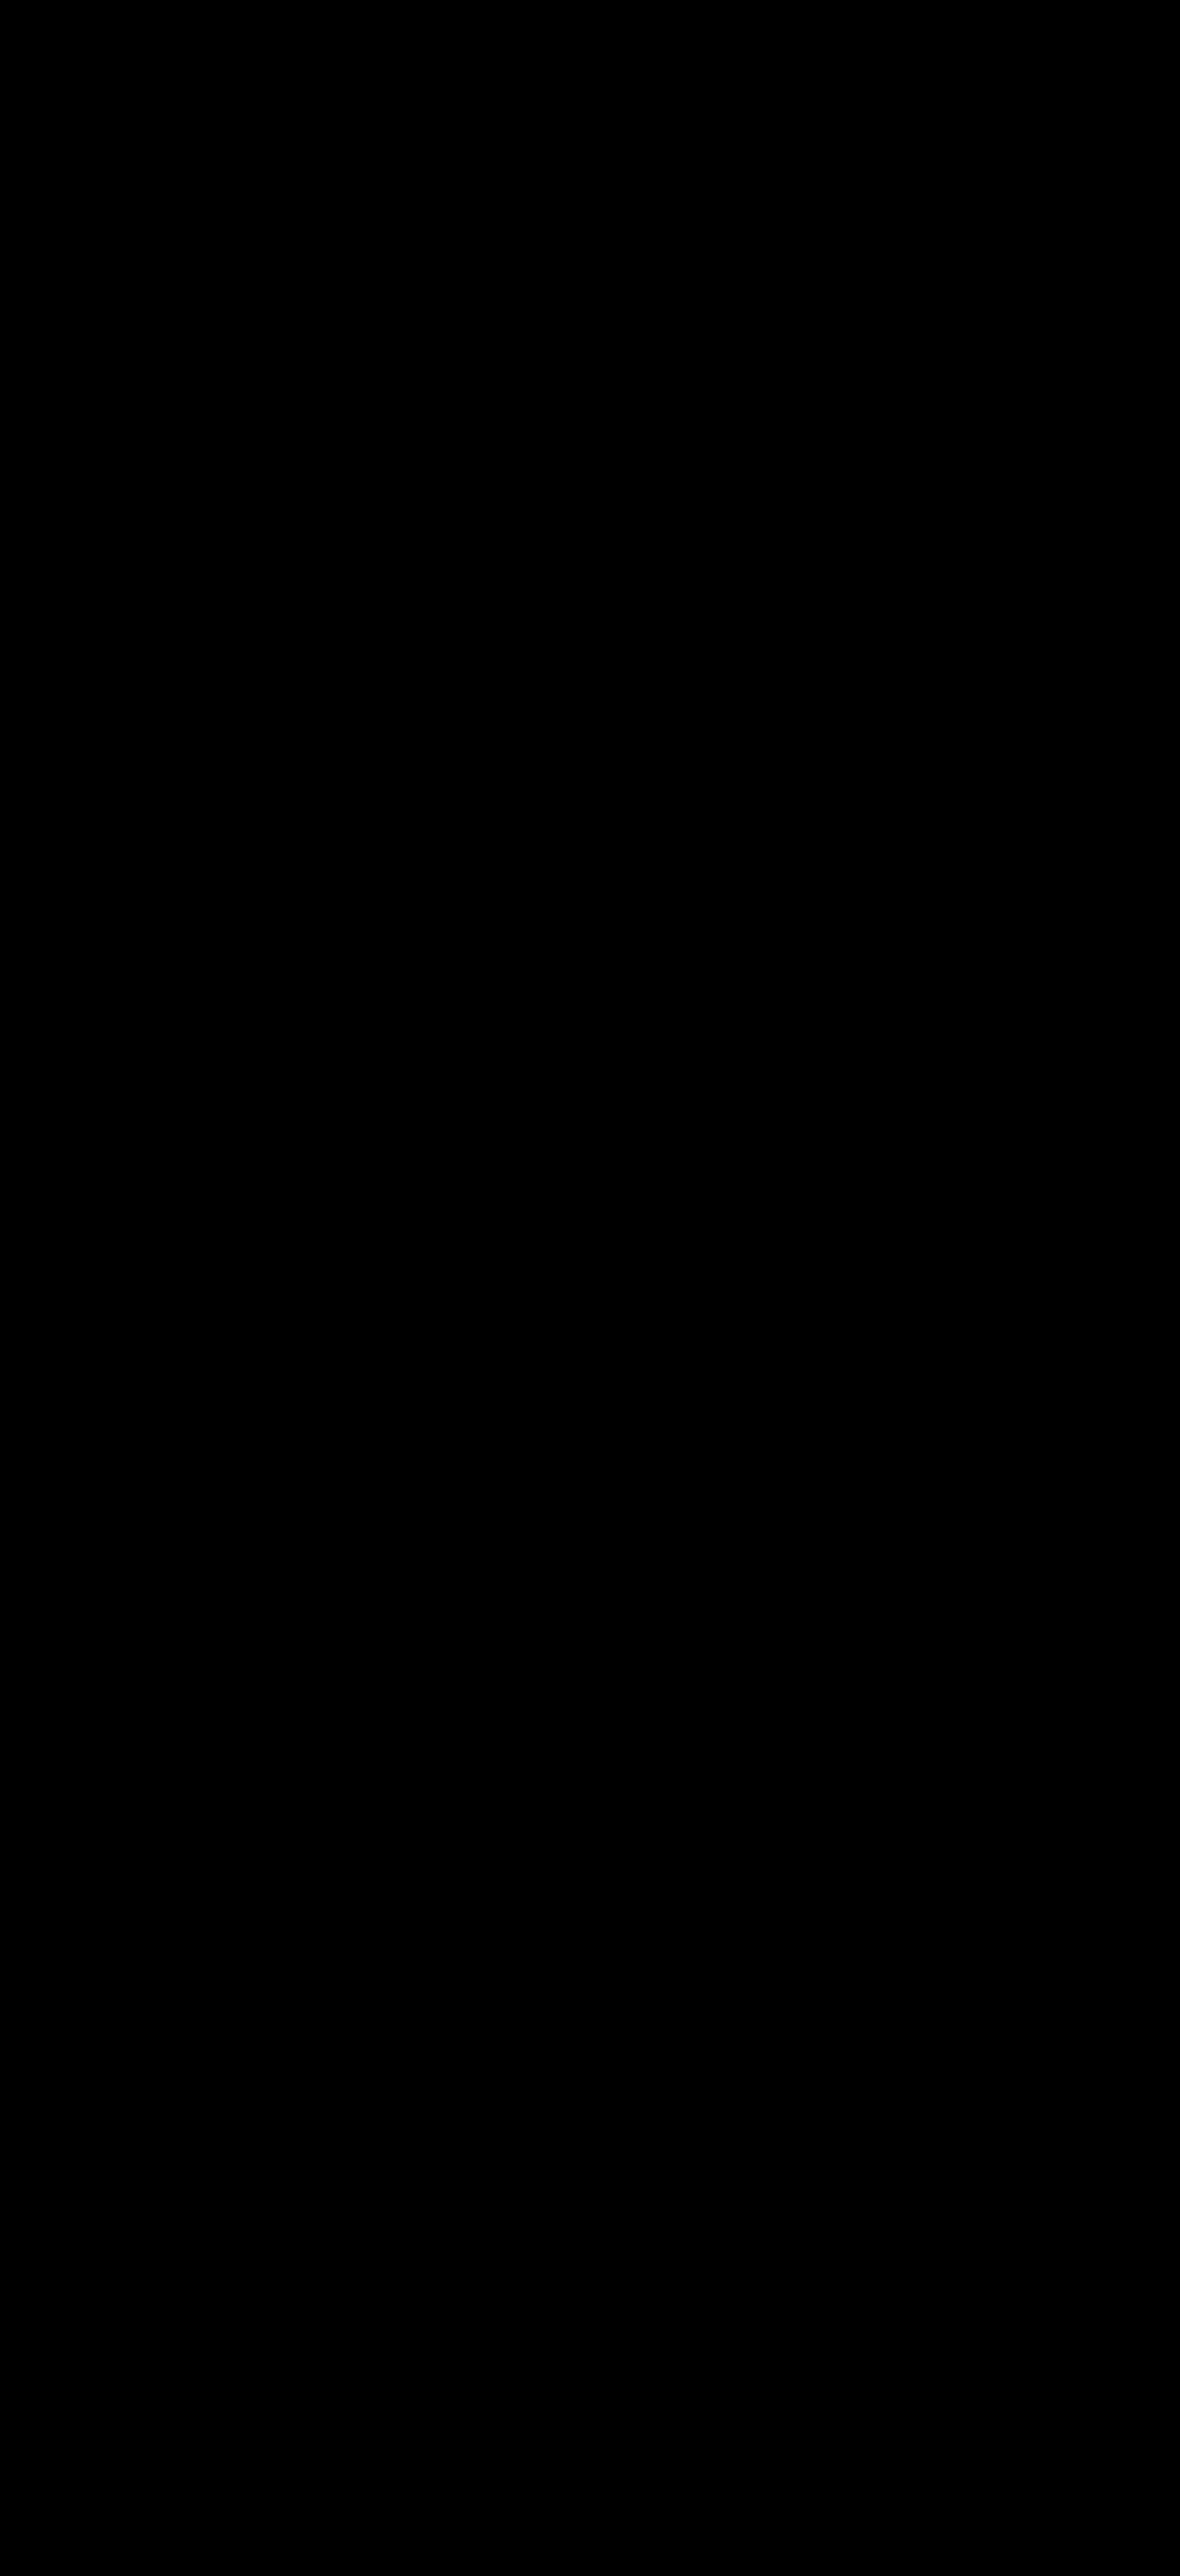 2000x4366 Fileband Silhouette 03.svg